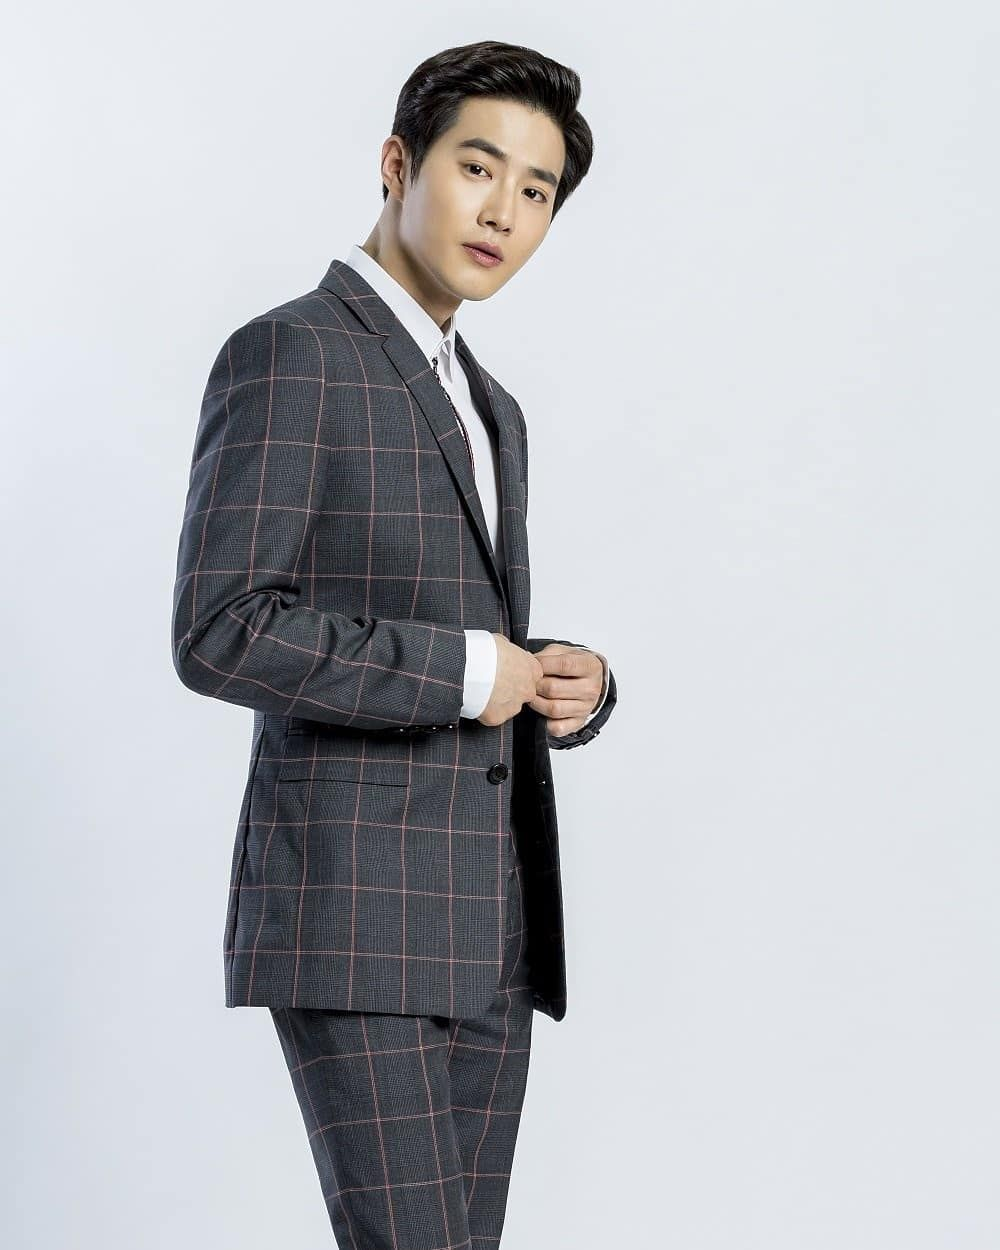 Unik Dan Lucu Begini Panggilan Sayang 10 Idol Kpop Dari Fans Indonesia Suho Exo Idol Fans